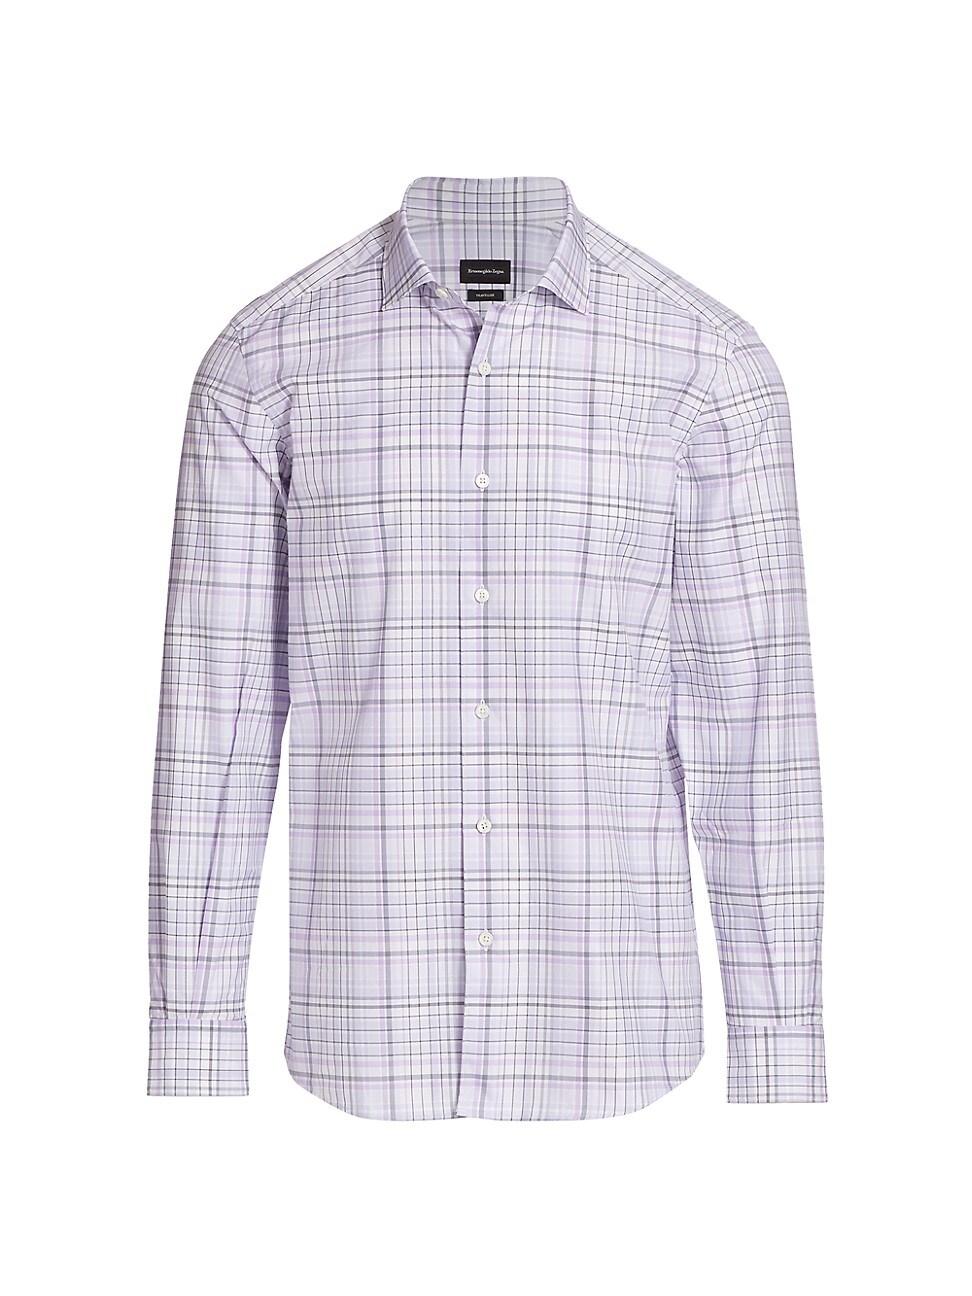 Ermenegildo Zegna Plaid Sport Shirt In Purple